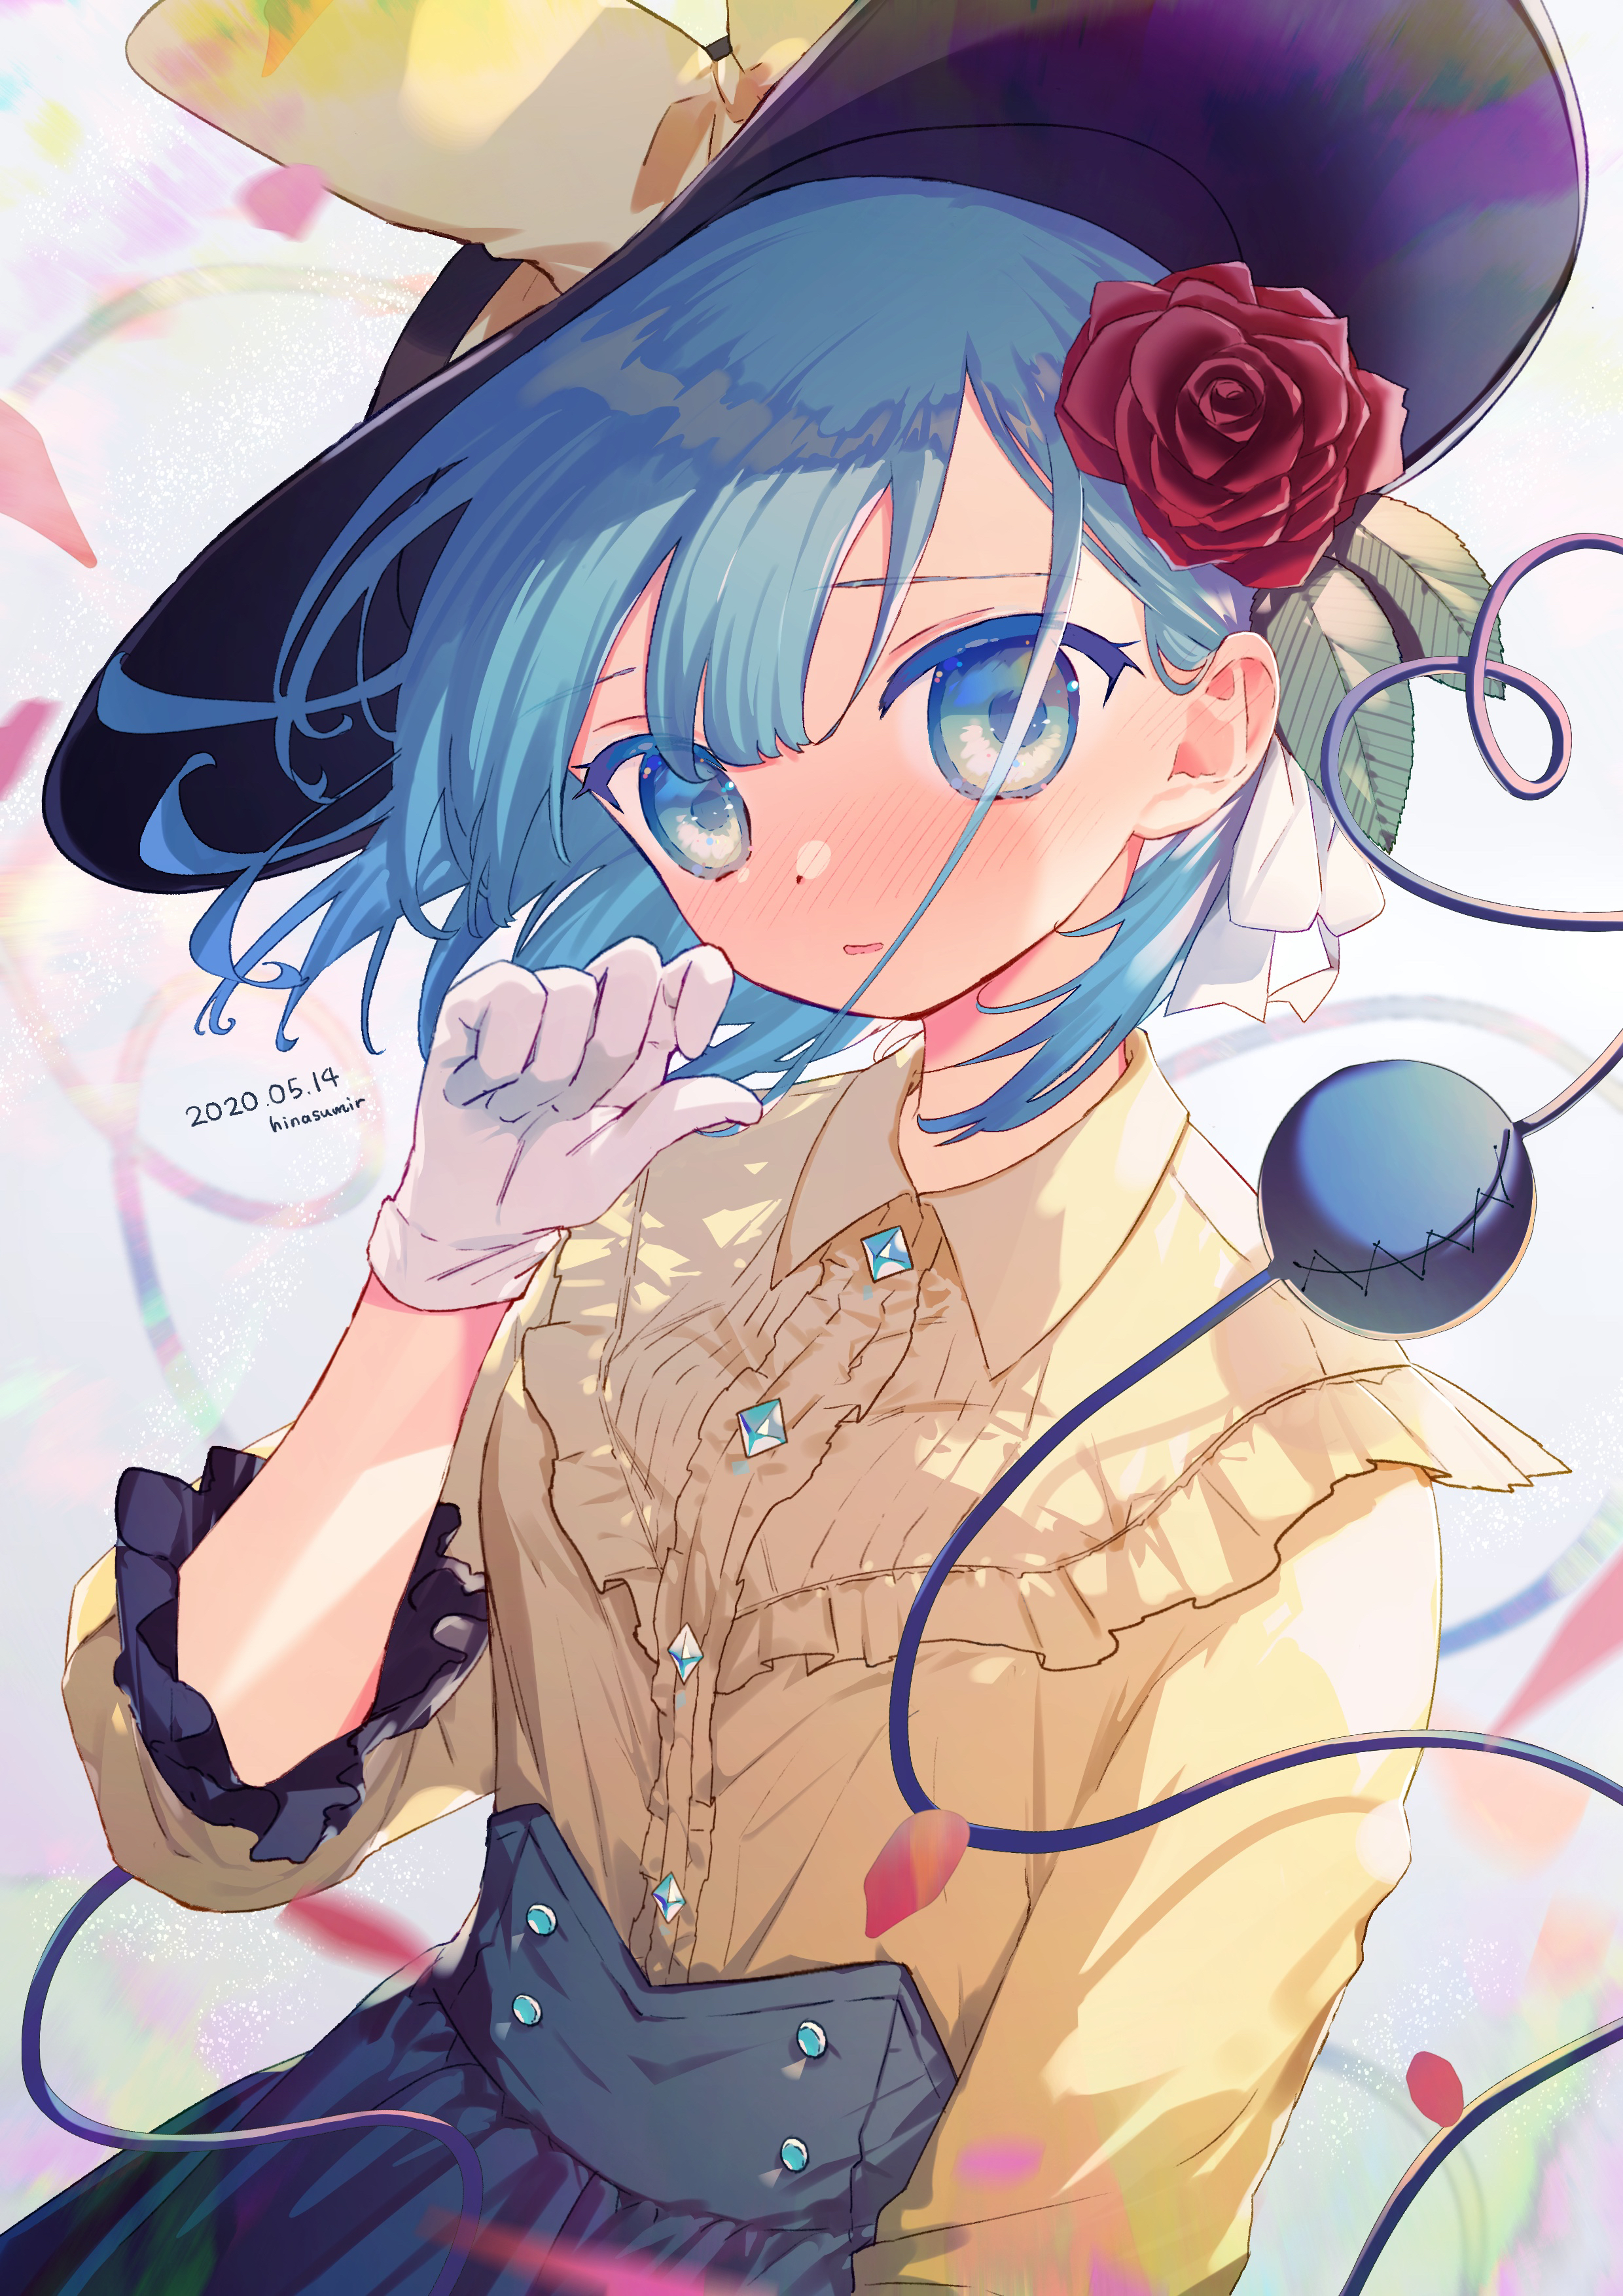 【P站画师】日本画师ひなすみれ的插画作品- ACG17.COM